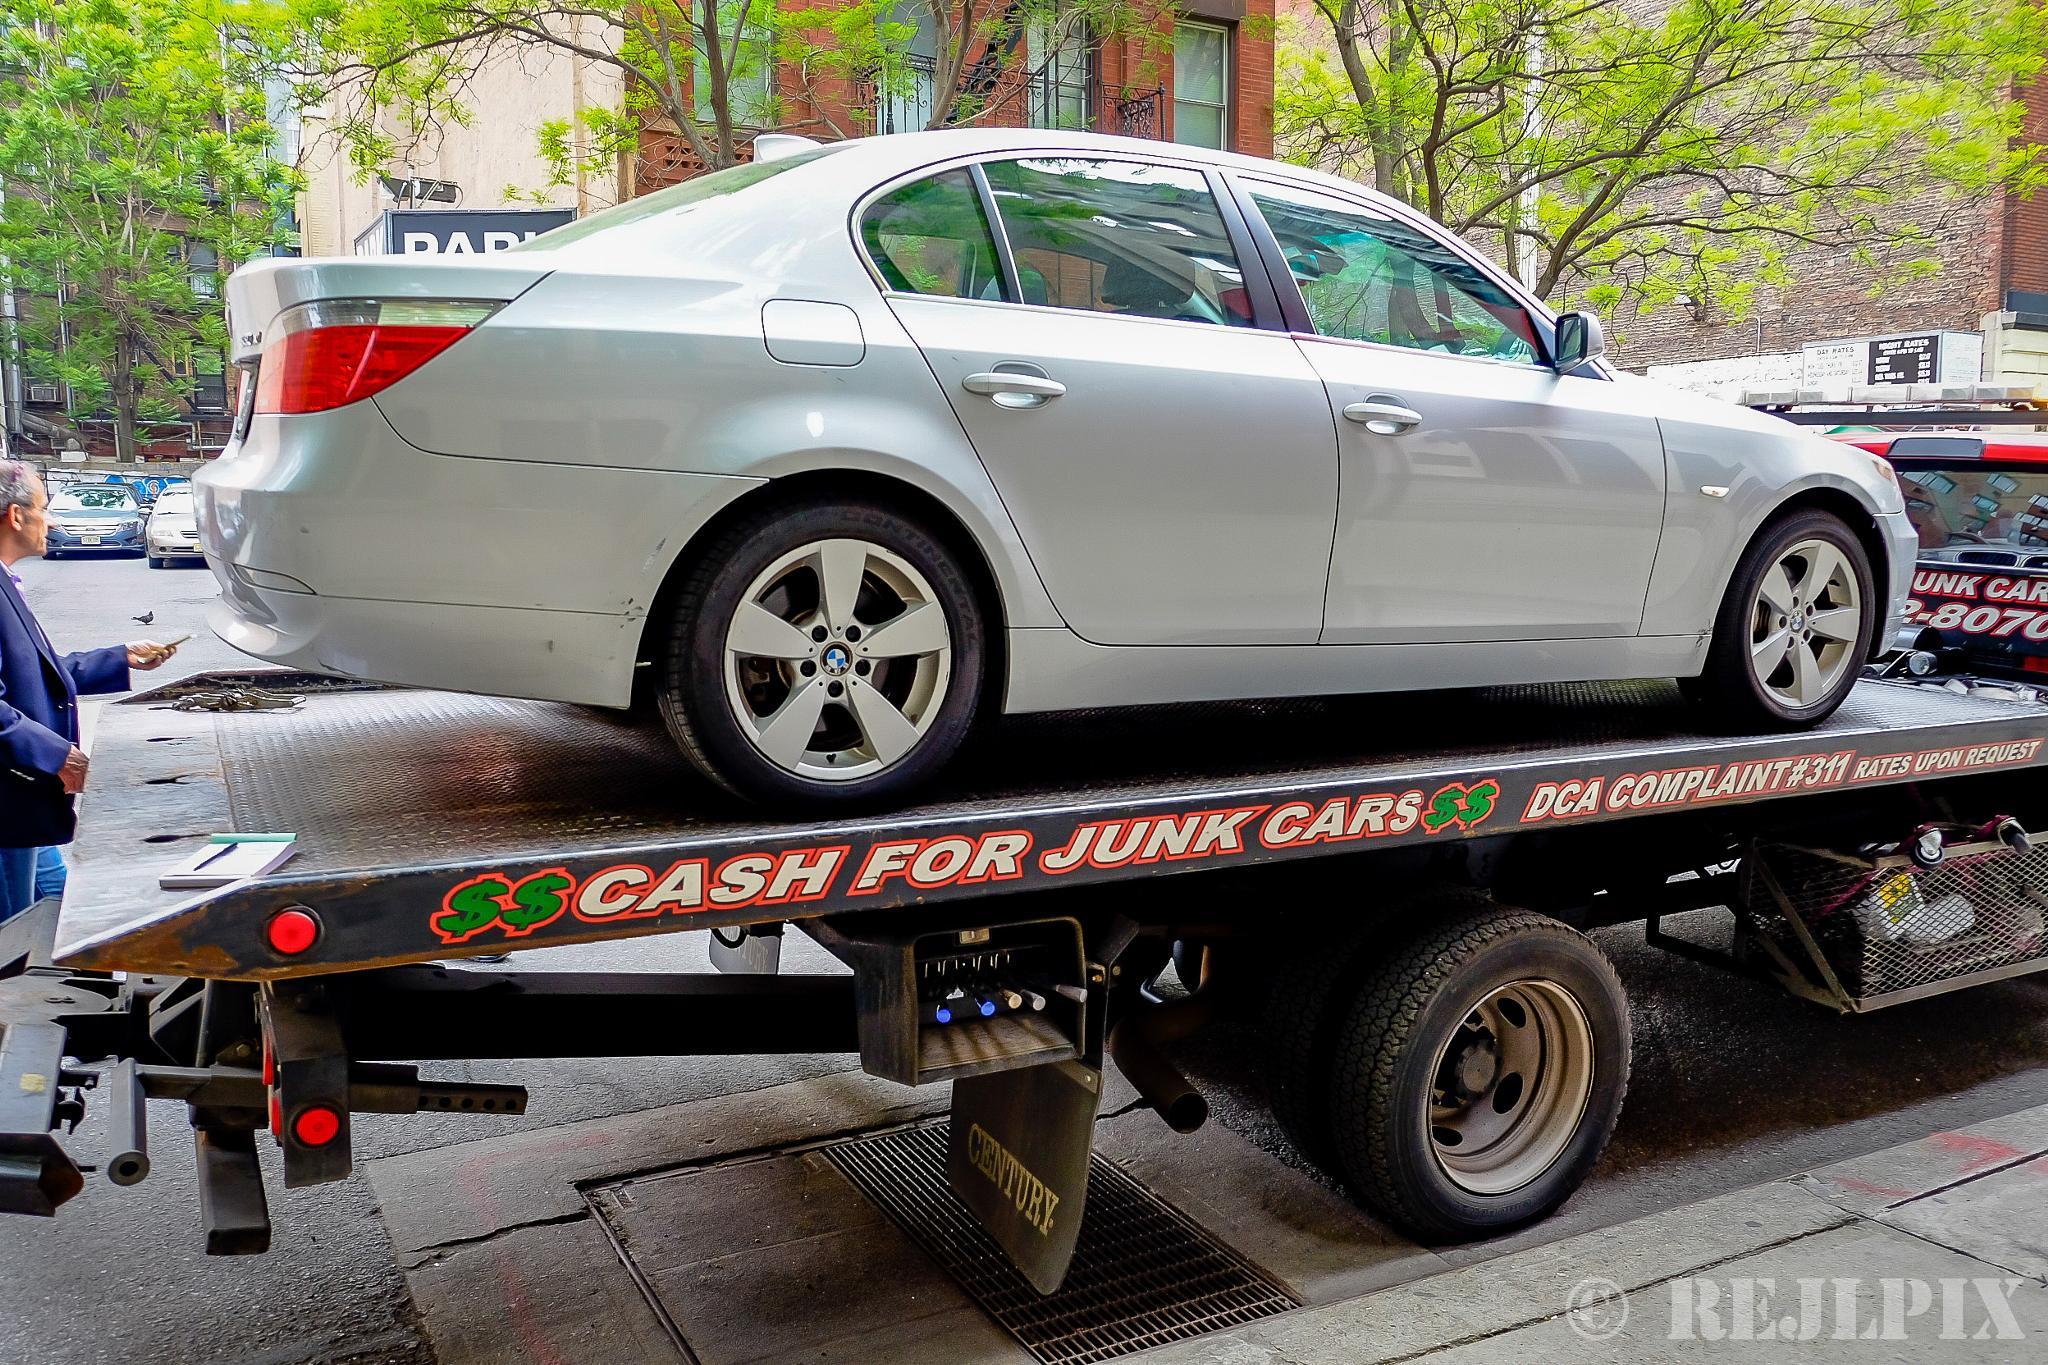 $$ Cash for junk cars $$ by REJL